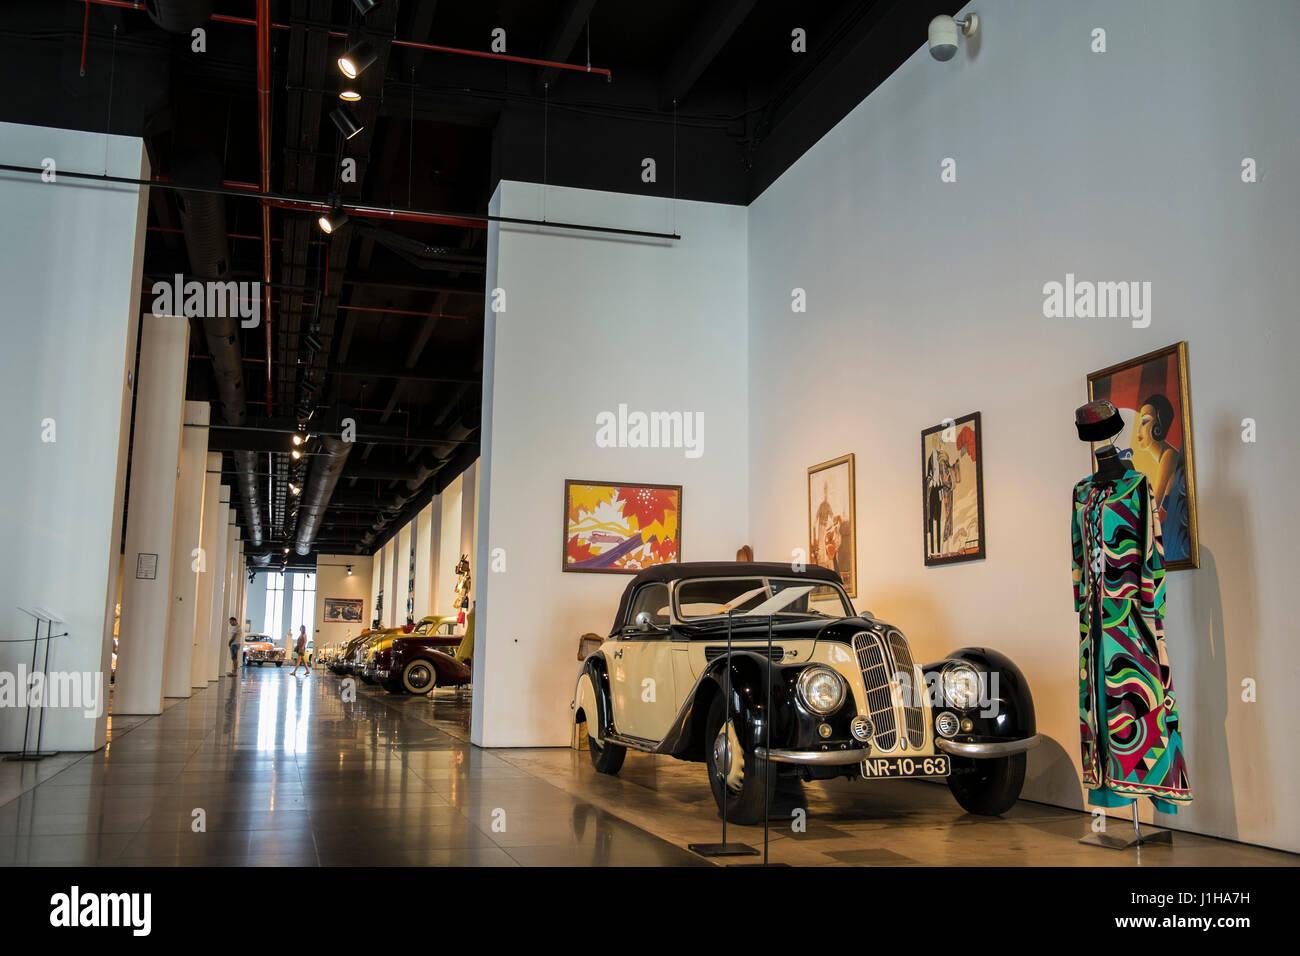 Automobile Museum of Málaga, Andalusia, Spain - Stock Image